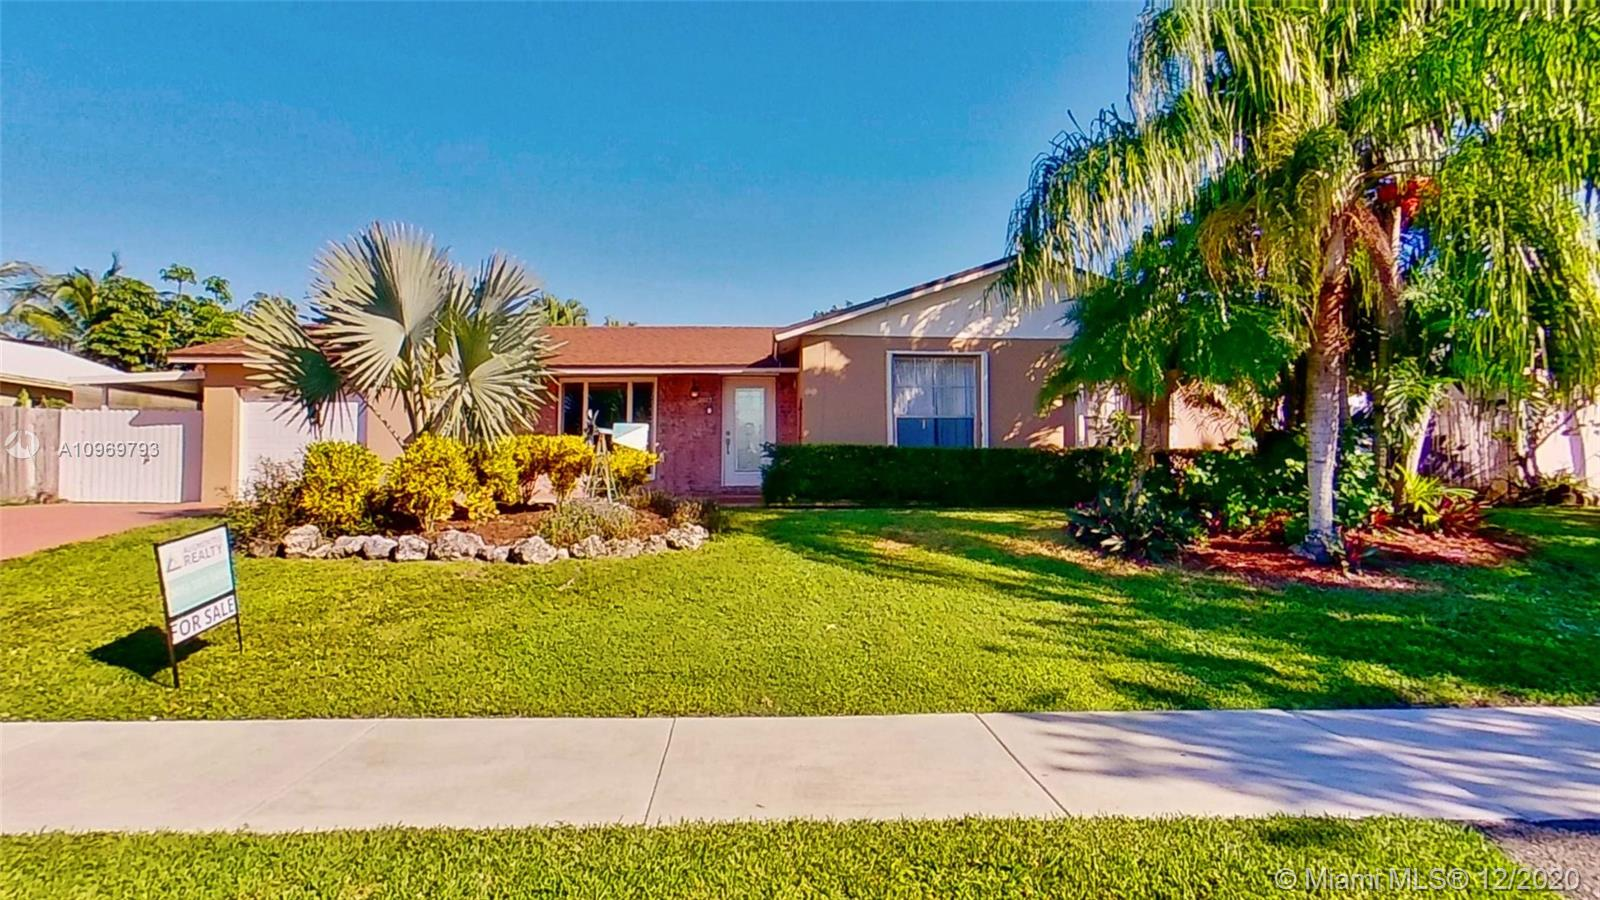 26175 Sw 124th Ct Property Photo